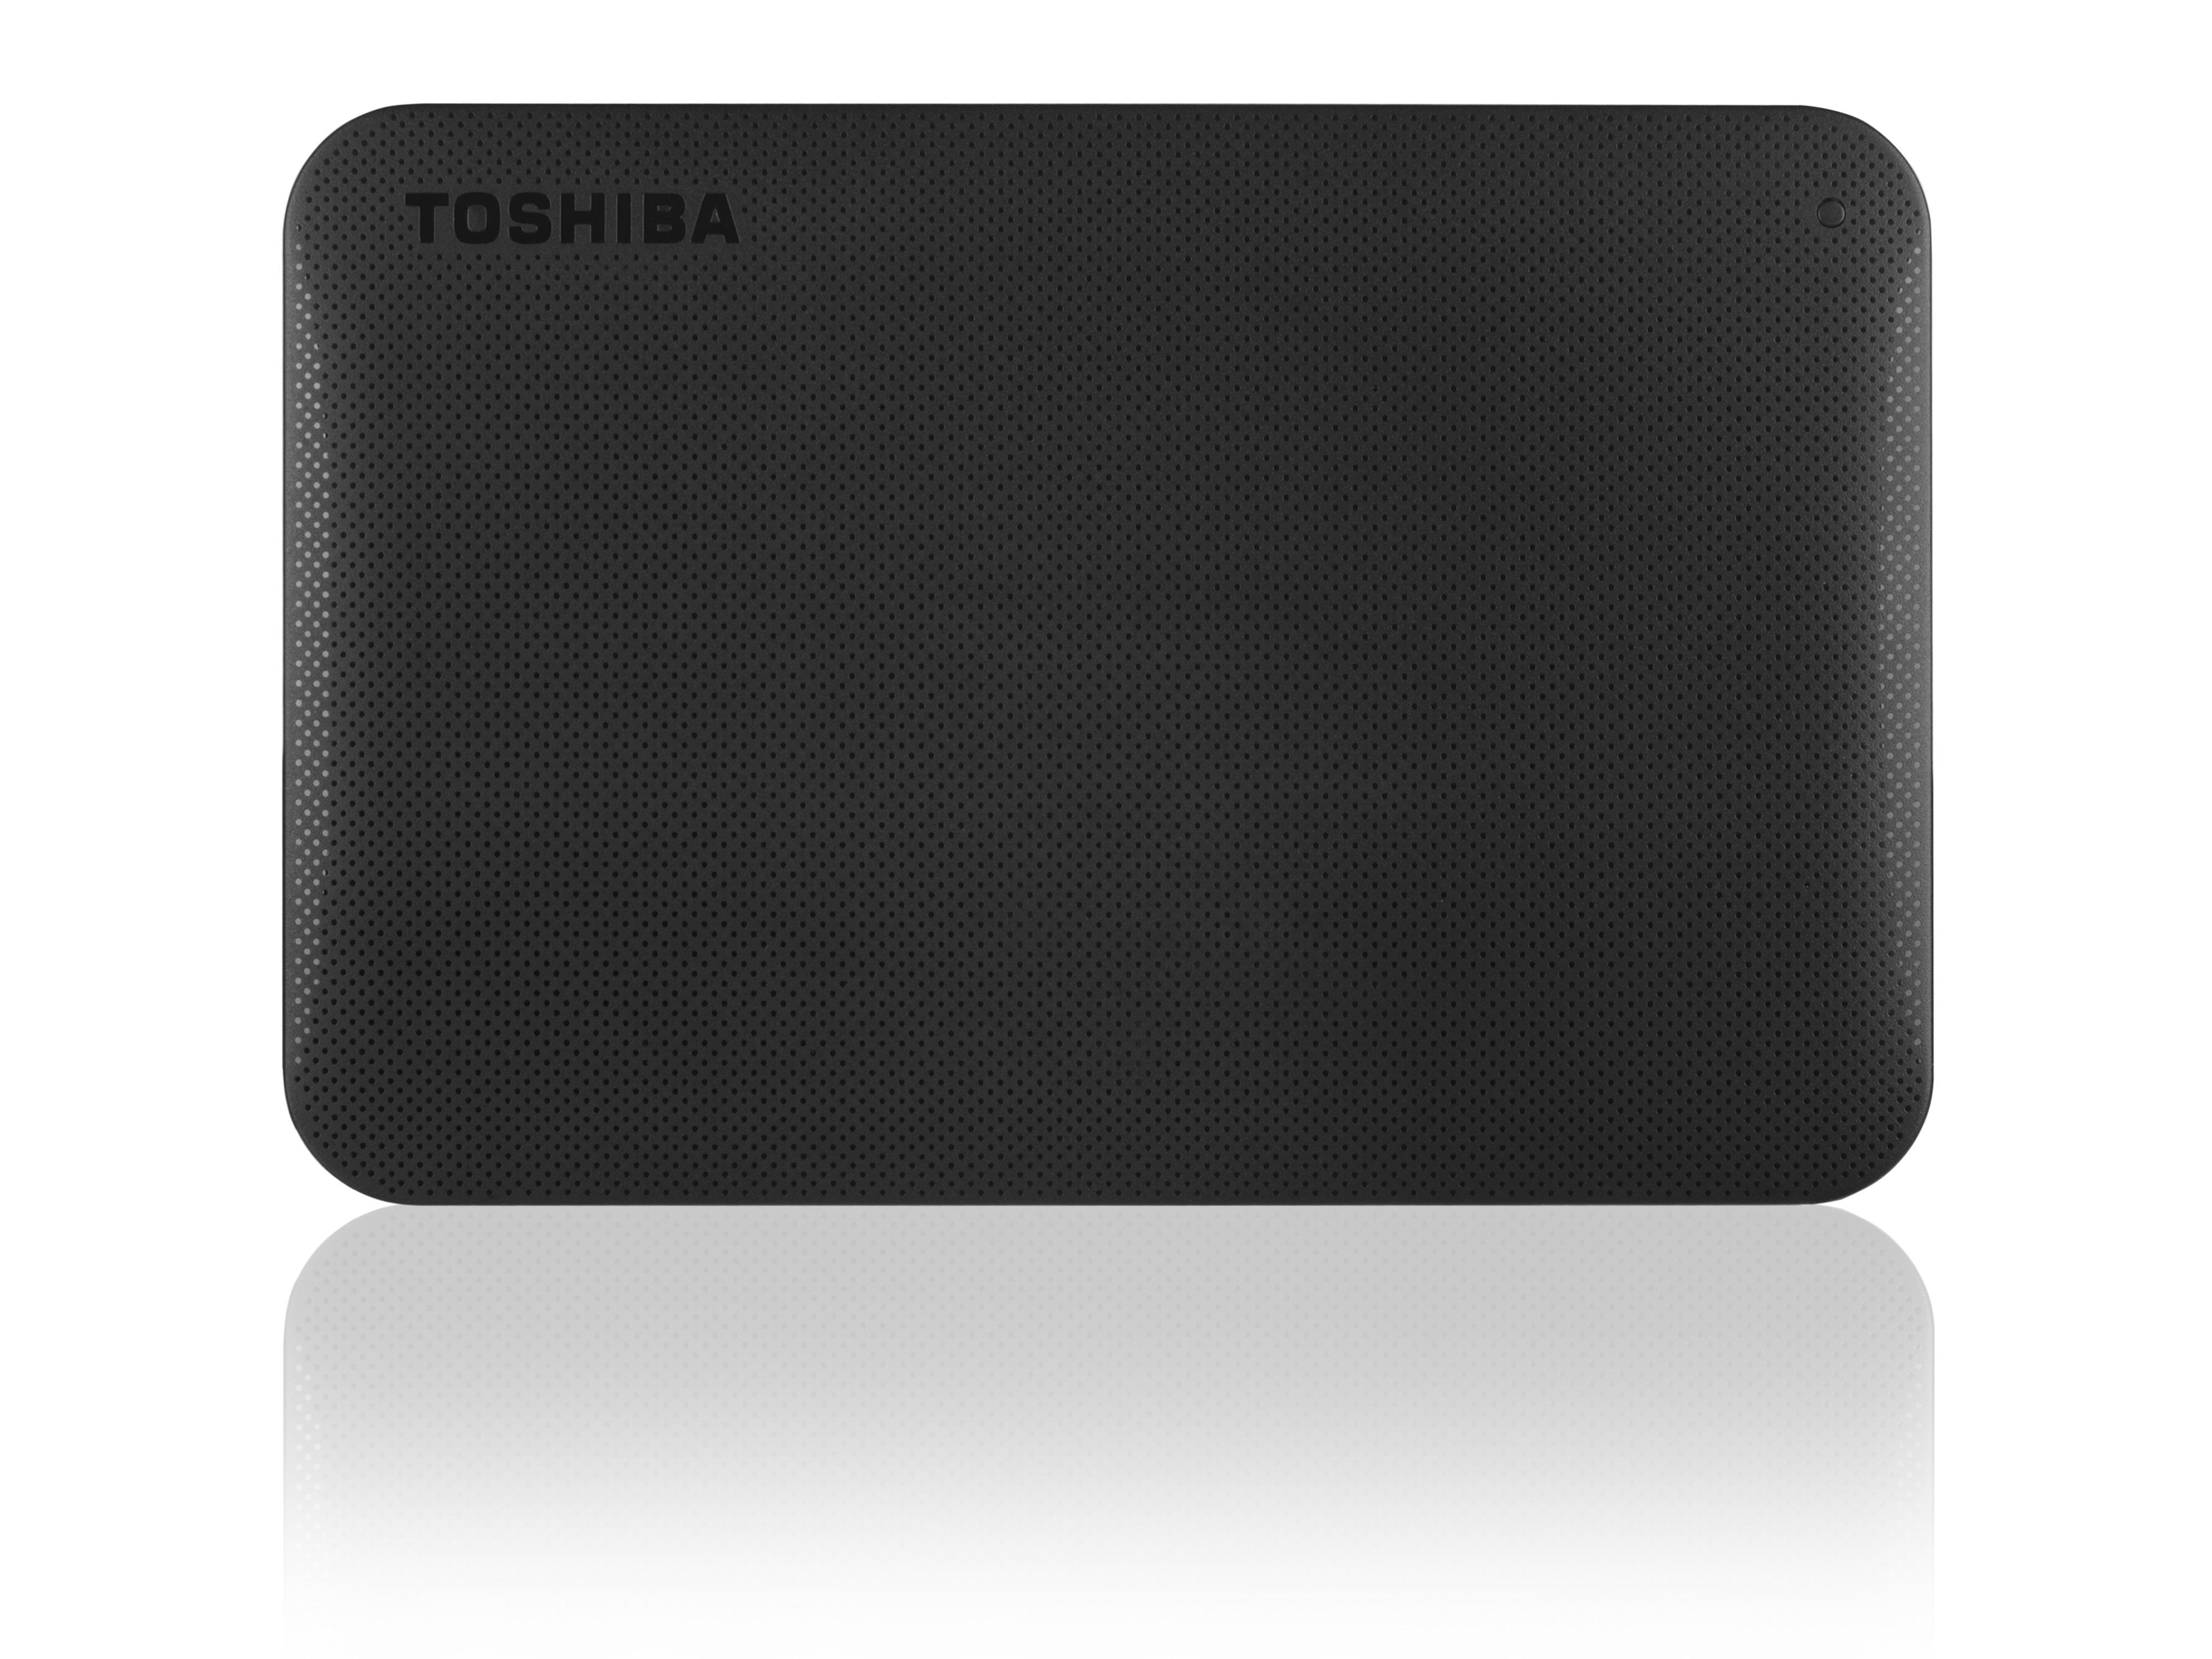 Toshiba externe harde schijf Canvio Connect II 500GB zwart